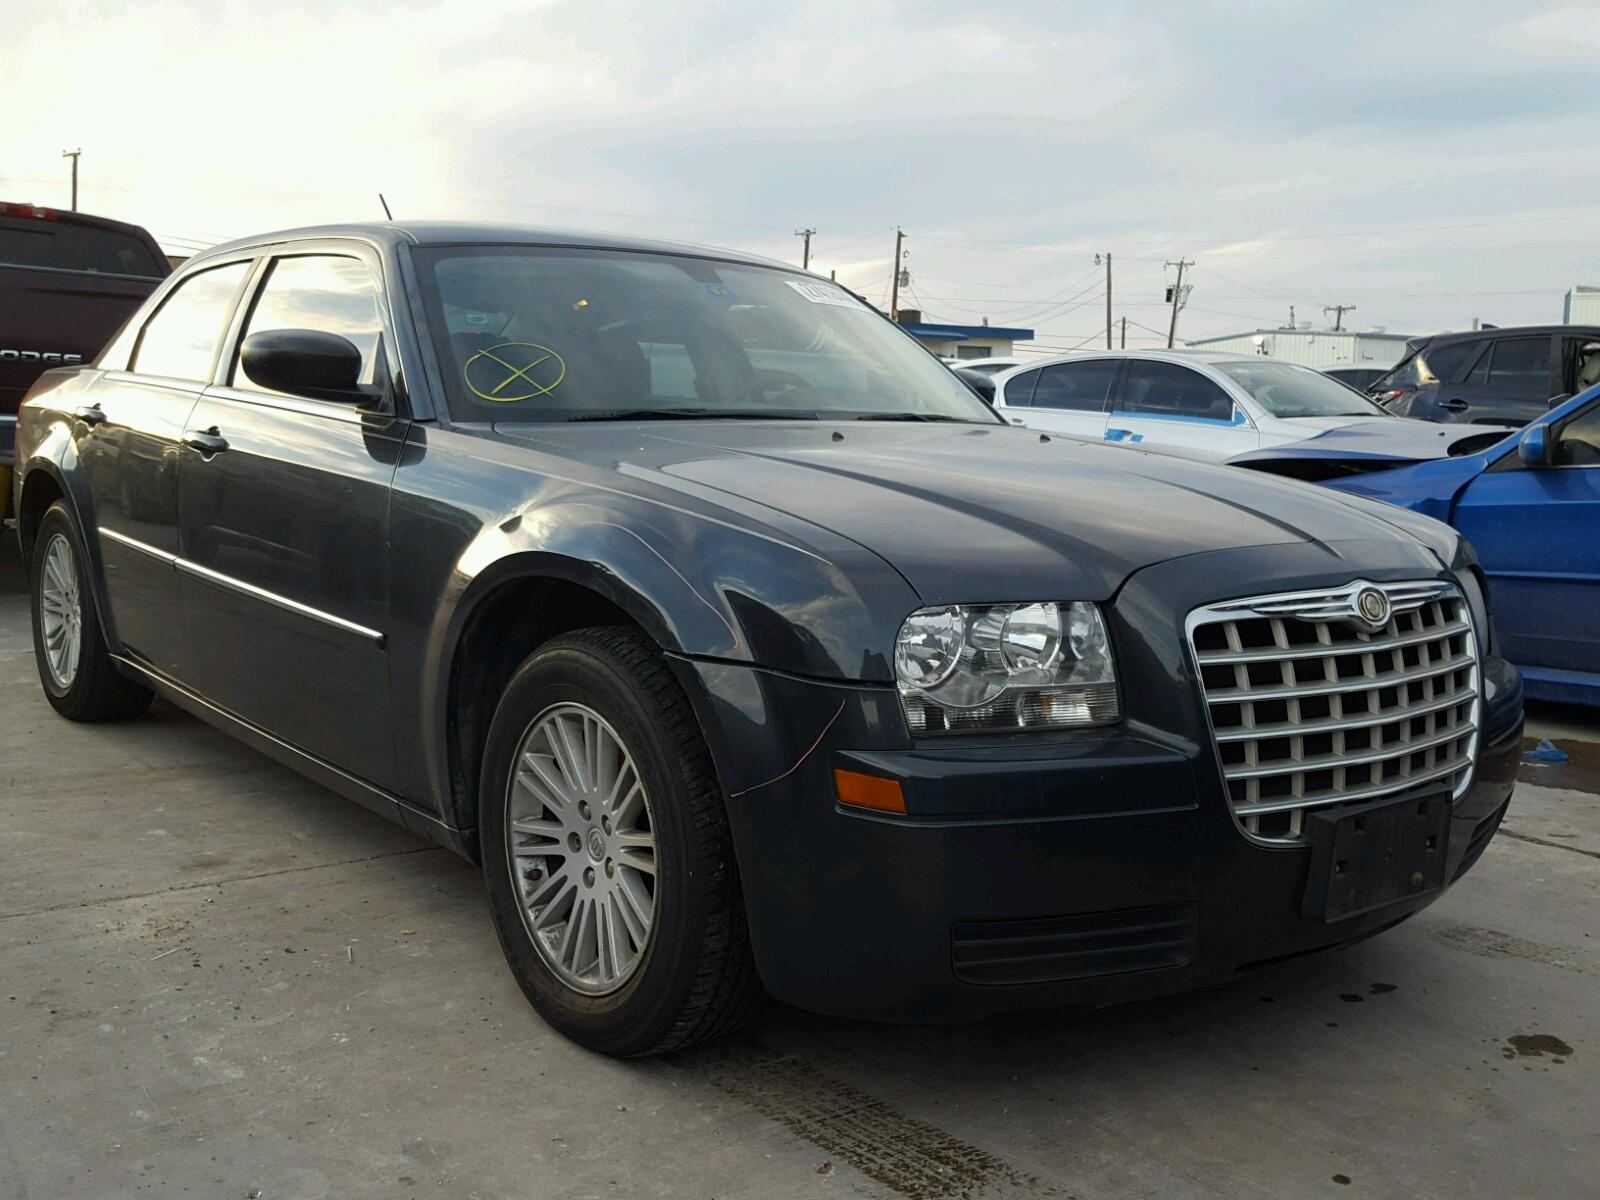 tx view en chrysler copart in lot title dallas online auctions auto sale black left salvage carfinder on vehicle